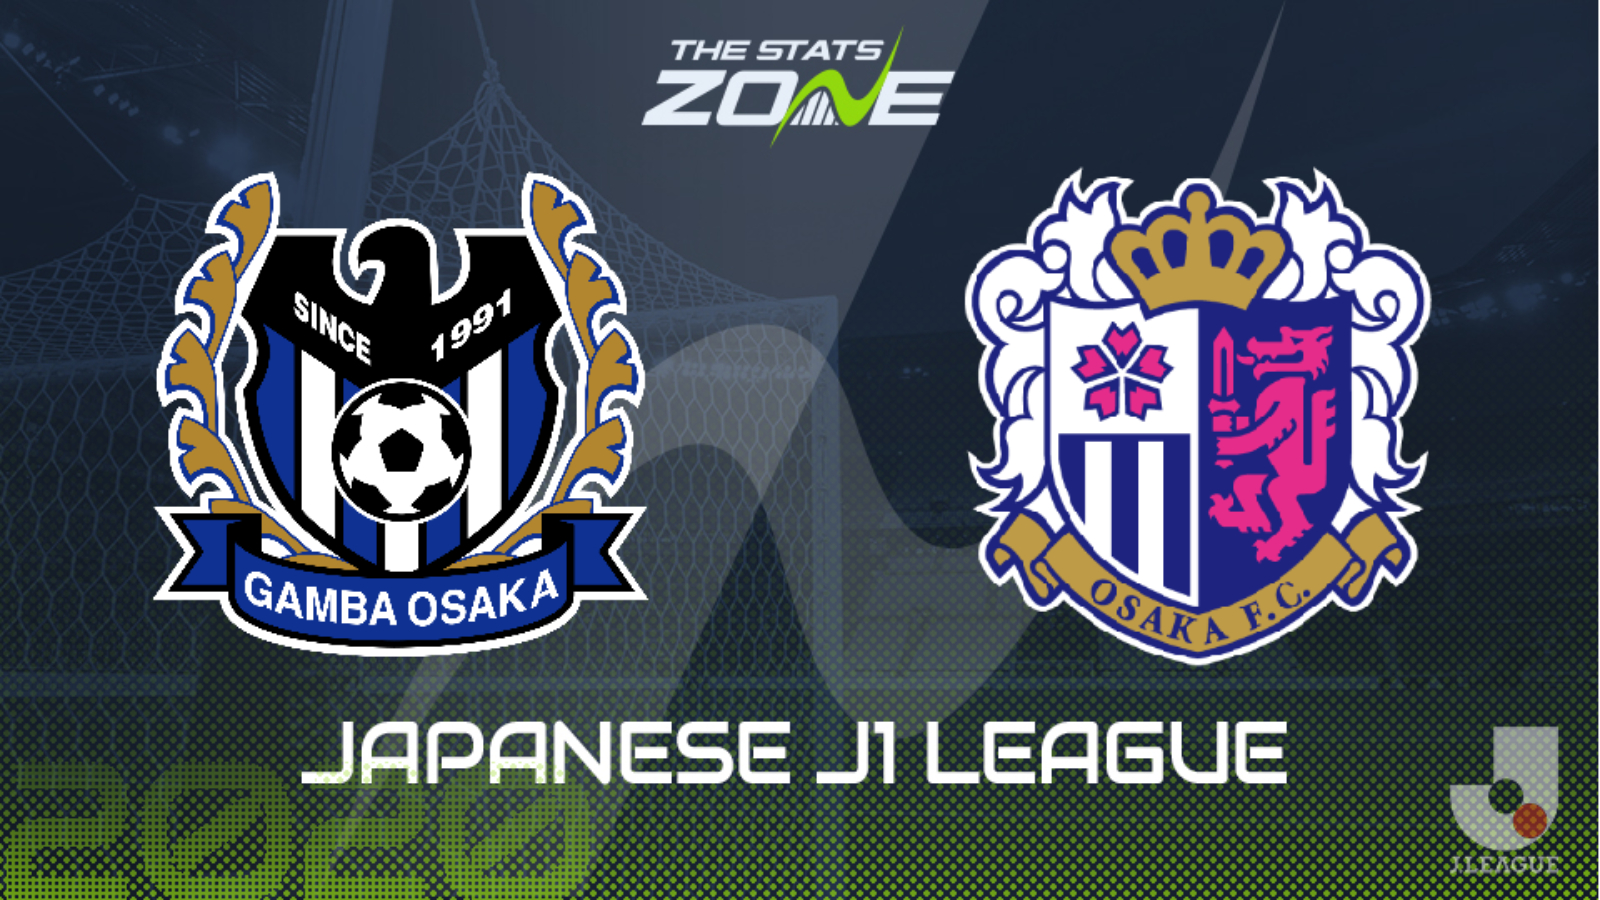 2019 20 Japanese J1 League Gamba Osaka Vs Cerezo Osaka Preview Prediction The Stats Zone